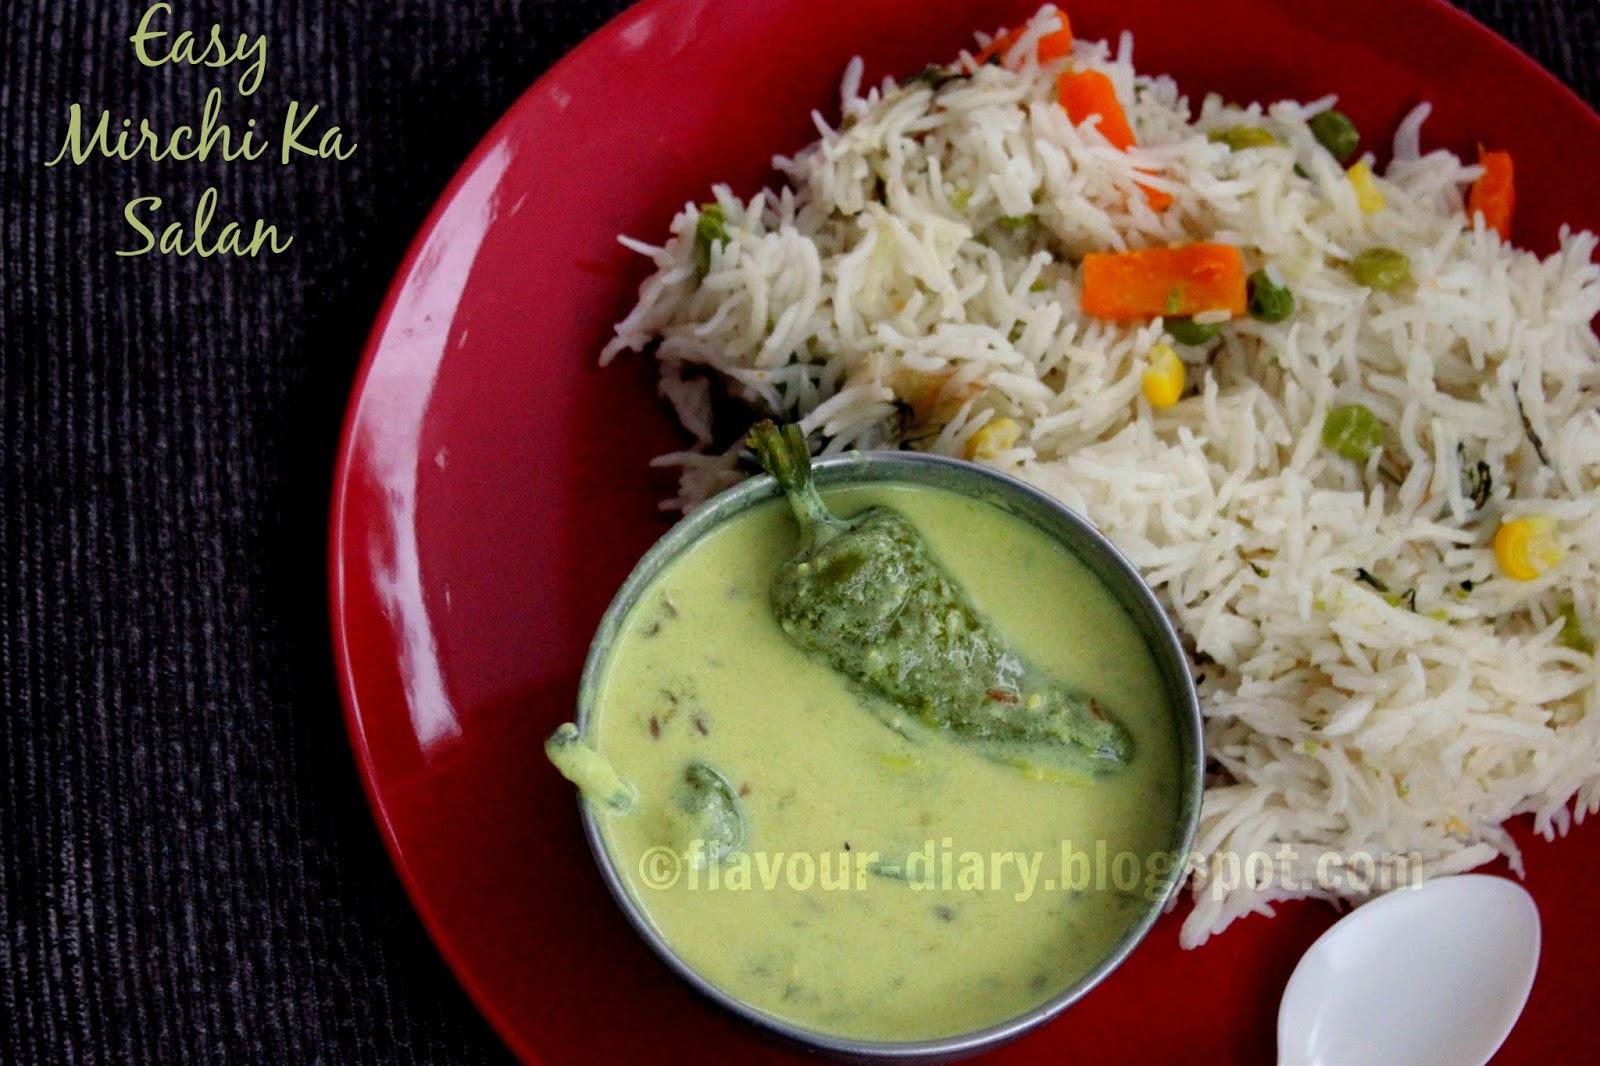 mirchi ka salan flavourdiary